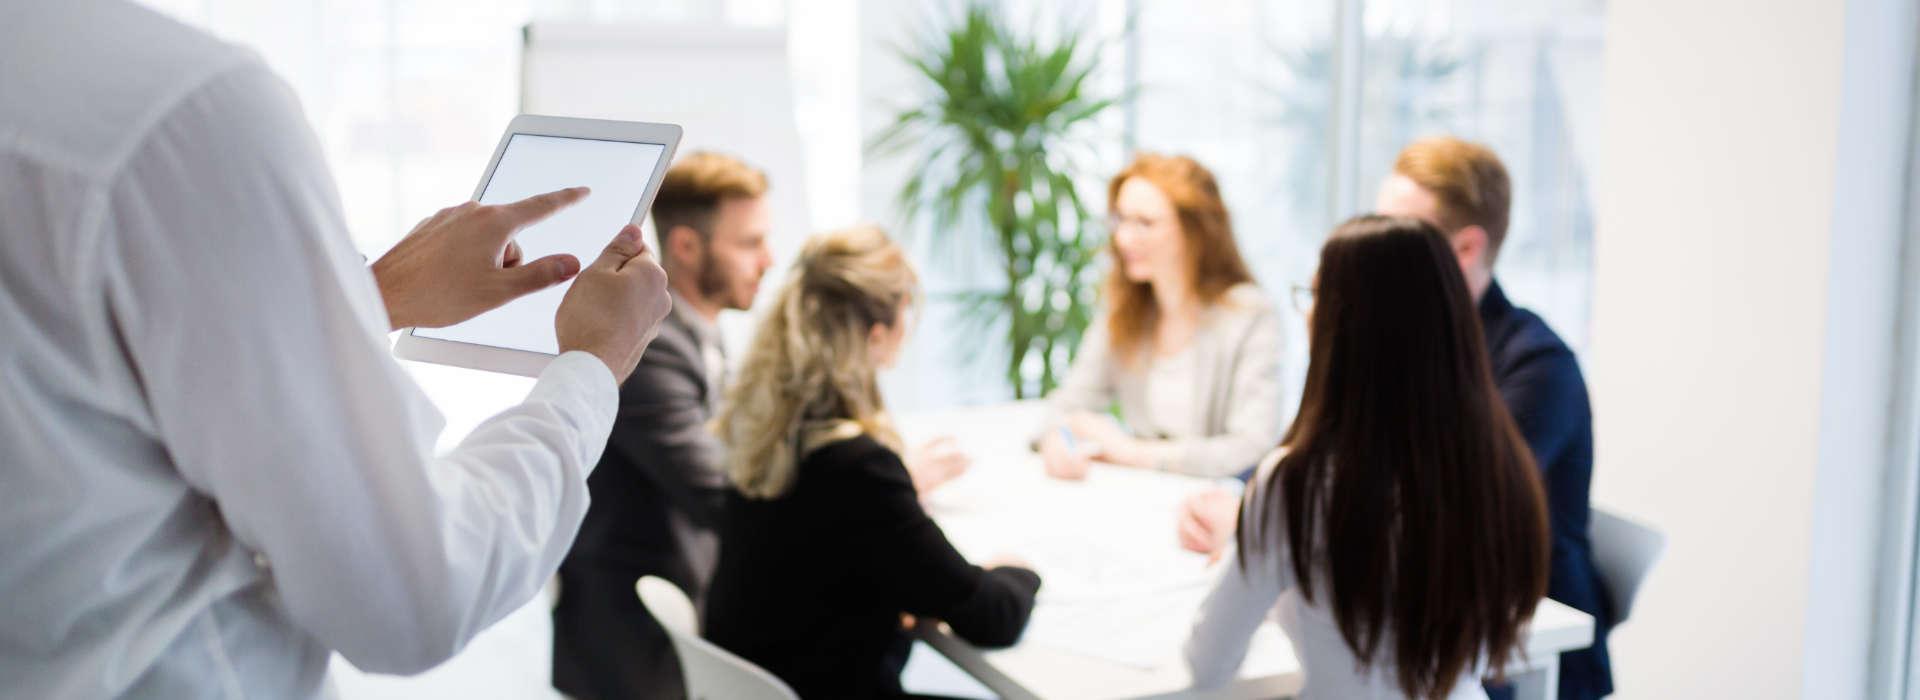 Sociedad Mercantil - El Asesor Online